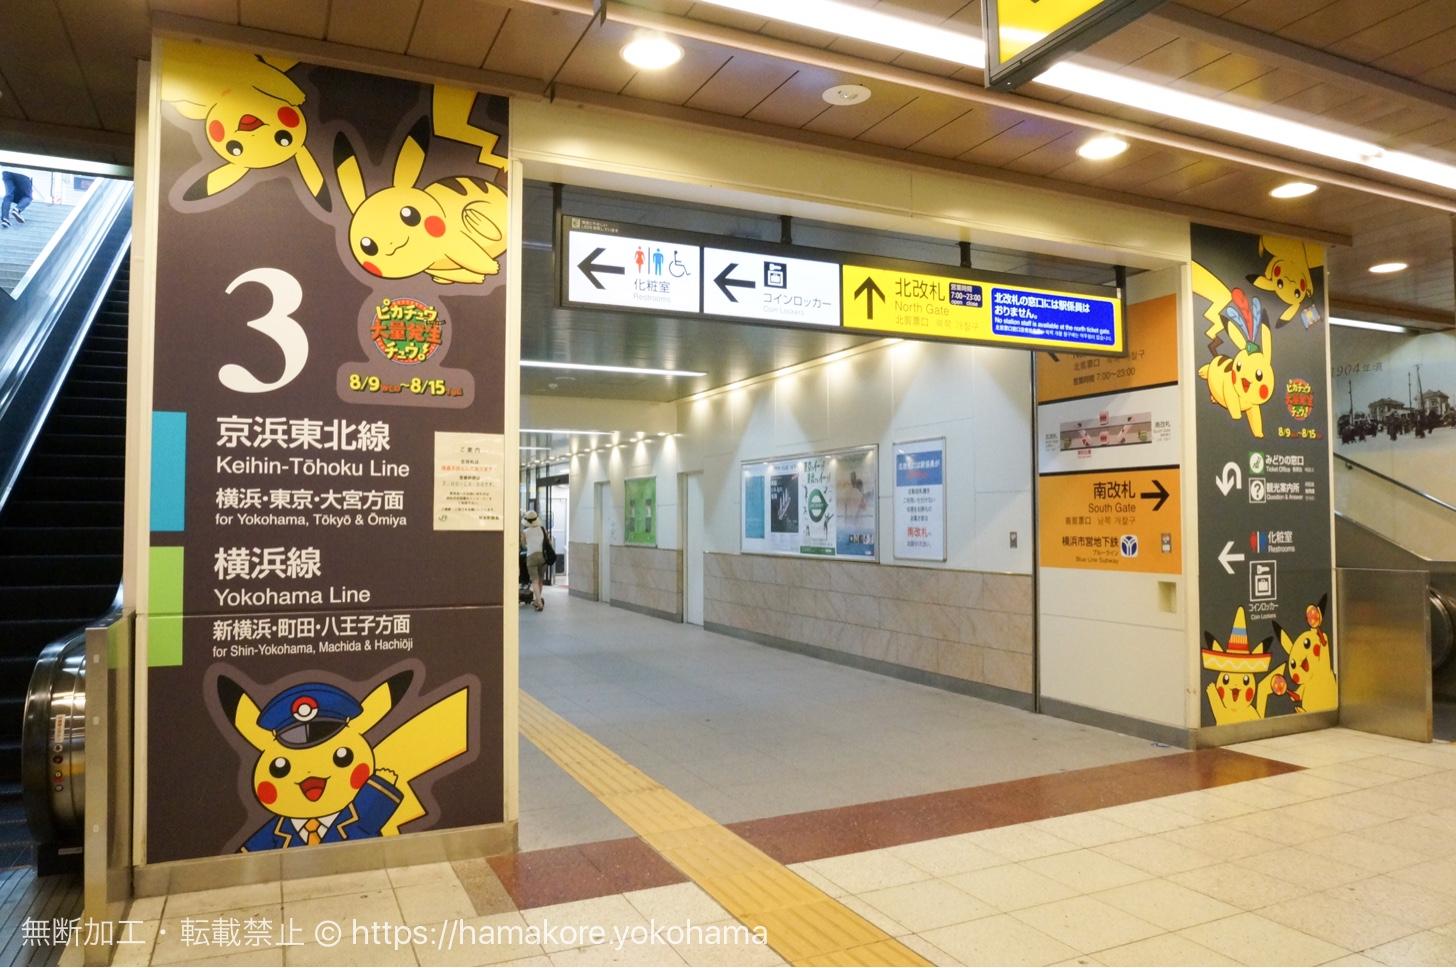 JR桜木町駅 番線案内のピカチュウ装飾